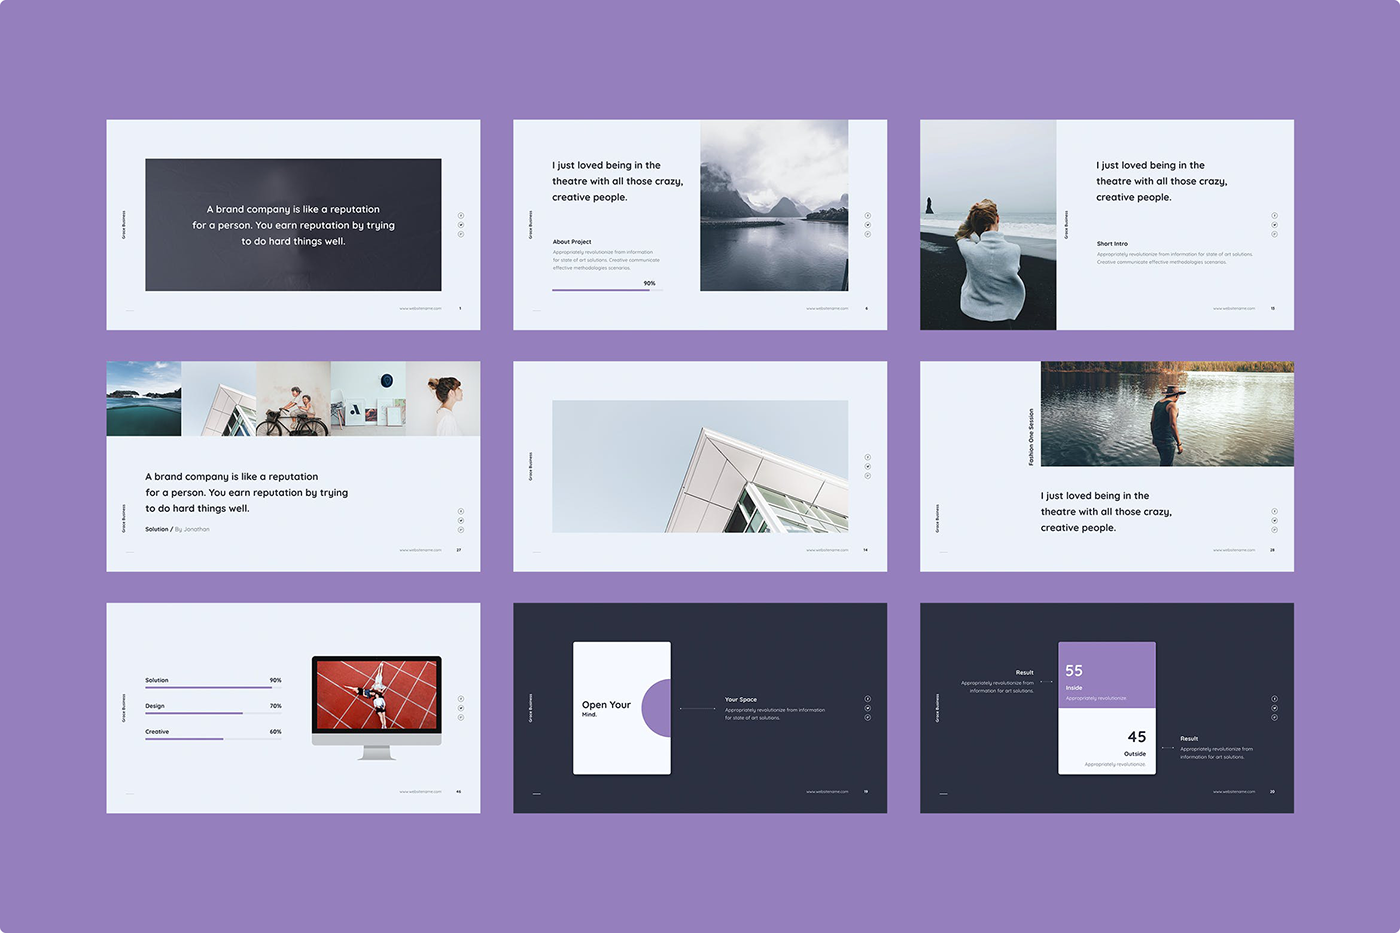 Notify - Animated & Creative Presentation Template (KEY) - 8